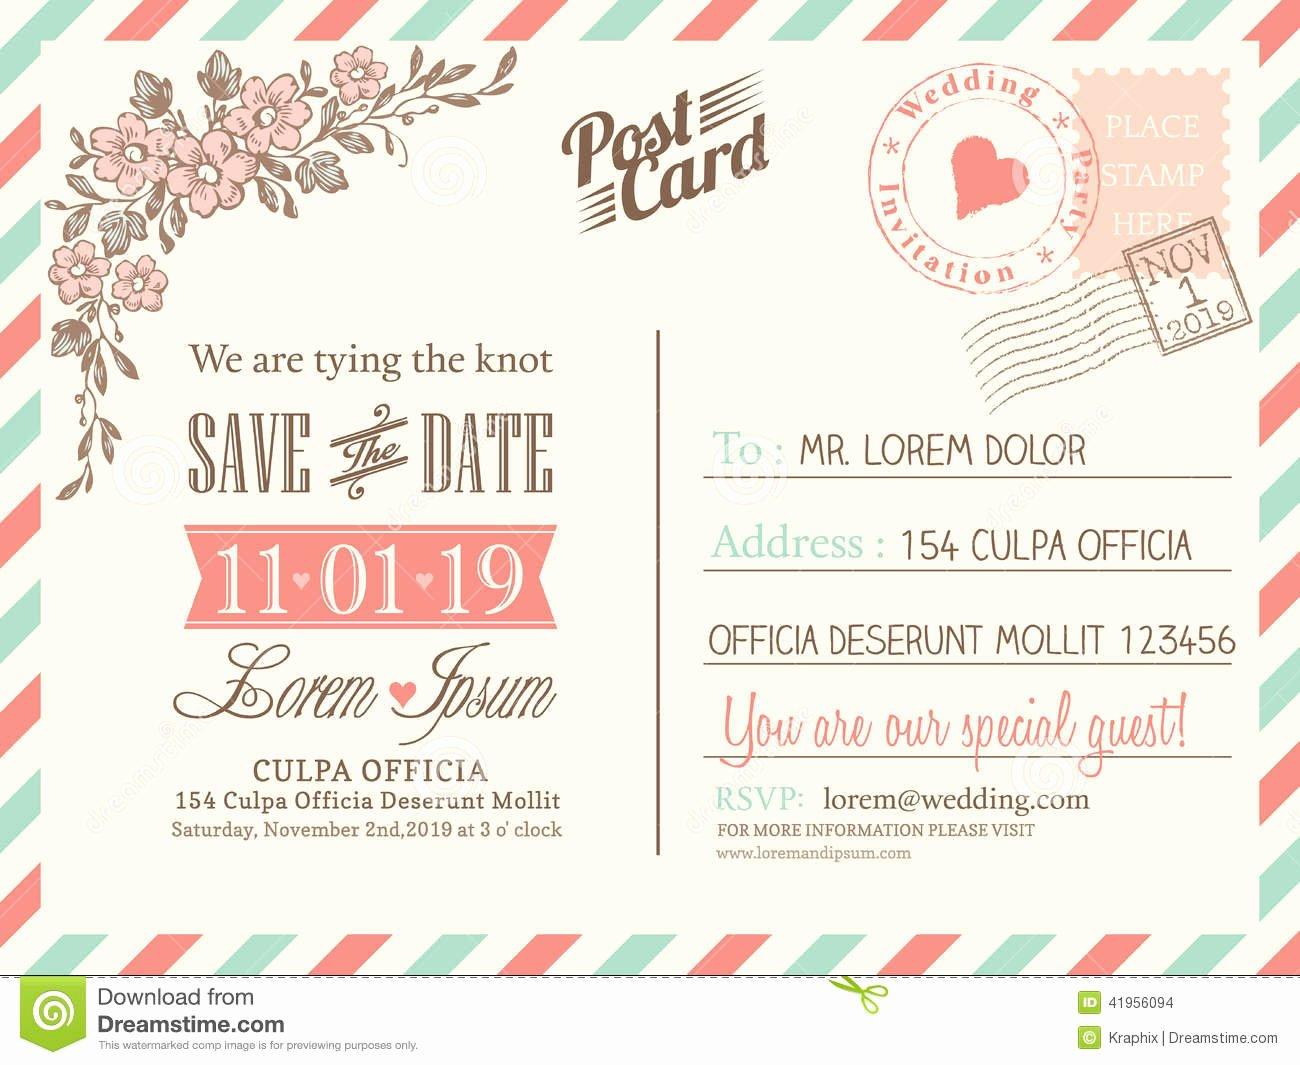 Postcard Wedding Invitations Template Beautiful Vintage Postcard Background for Wedding Invitation Stock